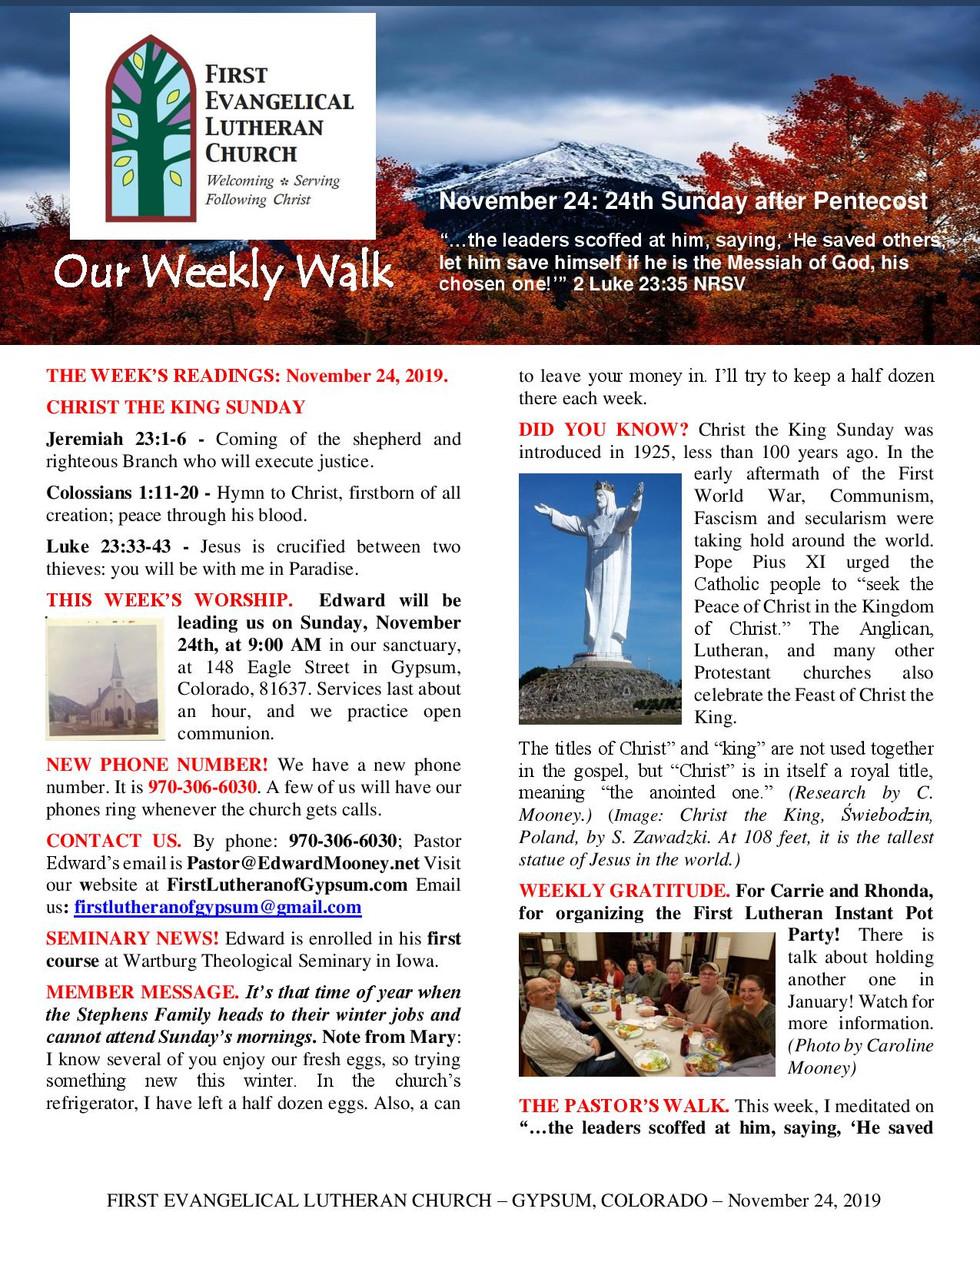 Newsletter, November 24, 2019, page 1